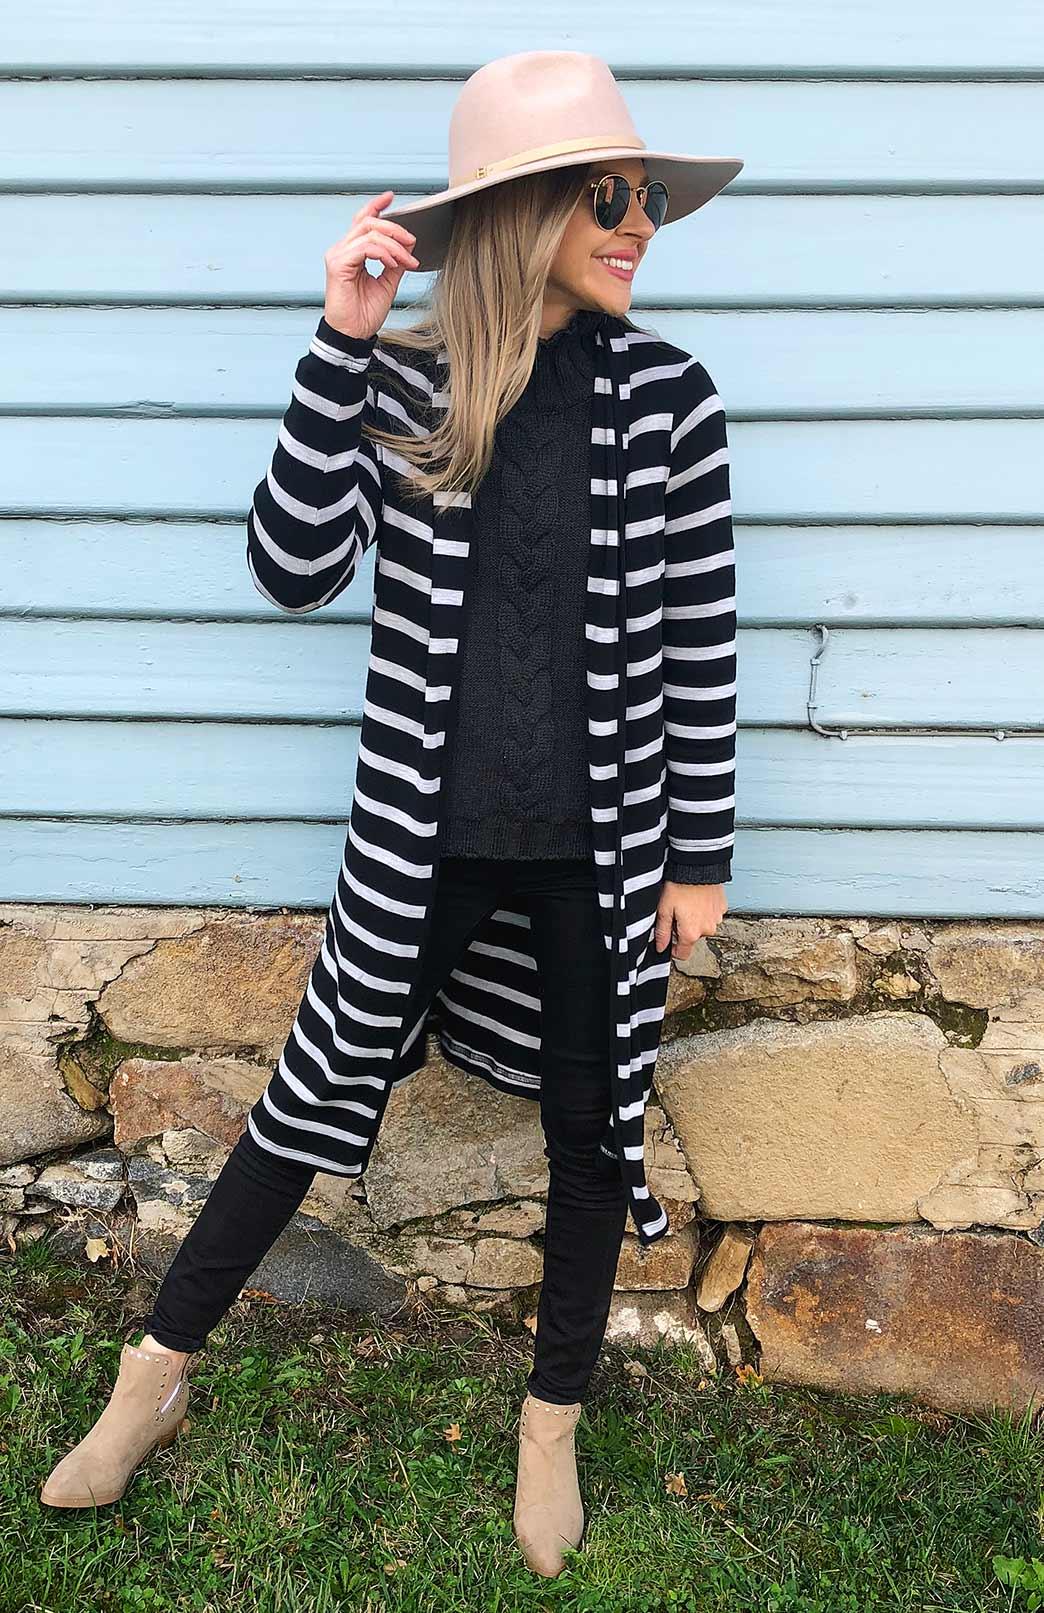 Long Drape Cardigan - Heavyweight - Women's Black and Grey Stripe Merino Wool Heavyweight Long Drape Cardigan - Smitten Merino Tasmania Australia